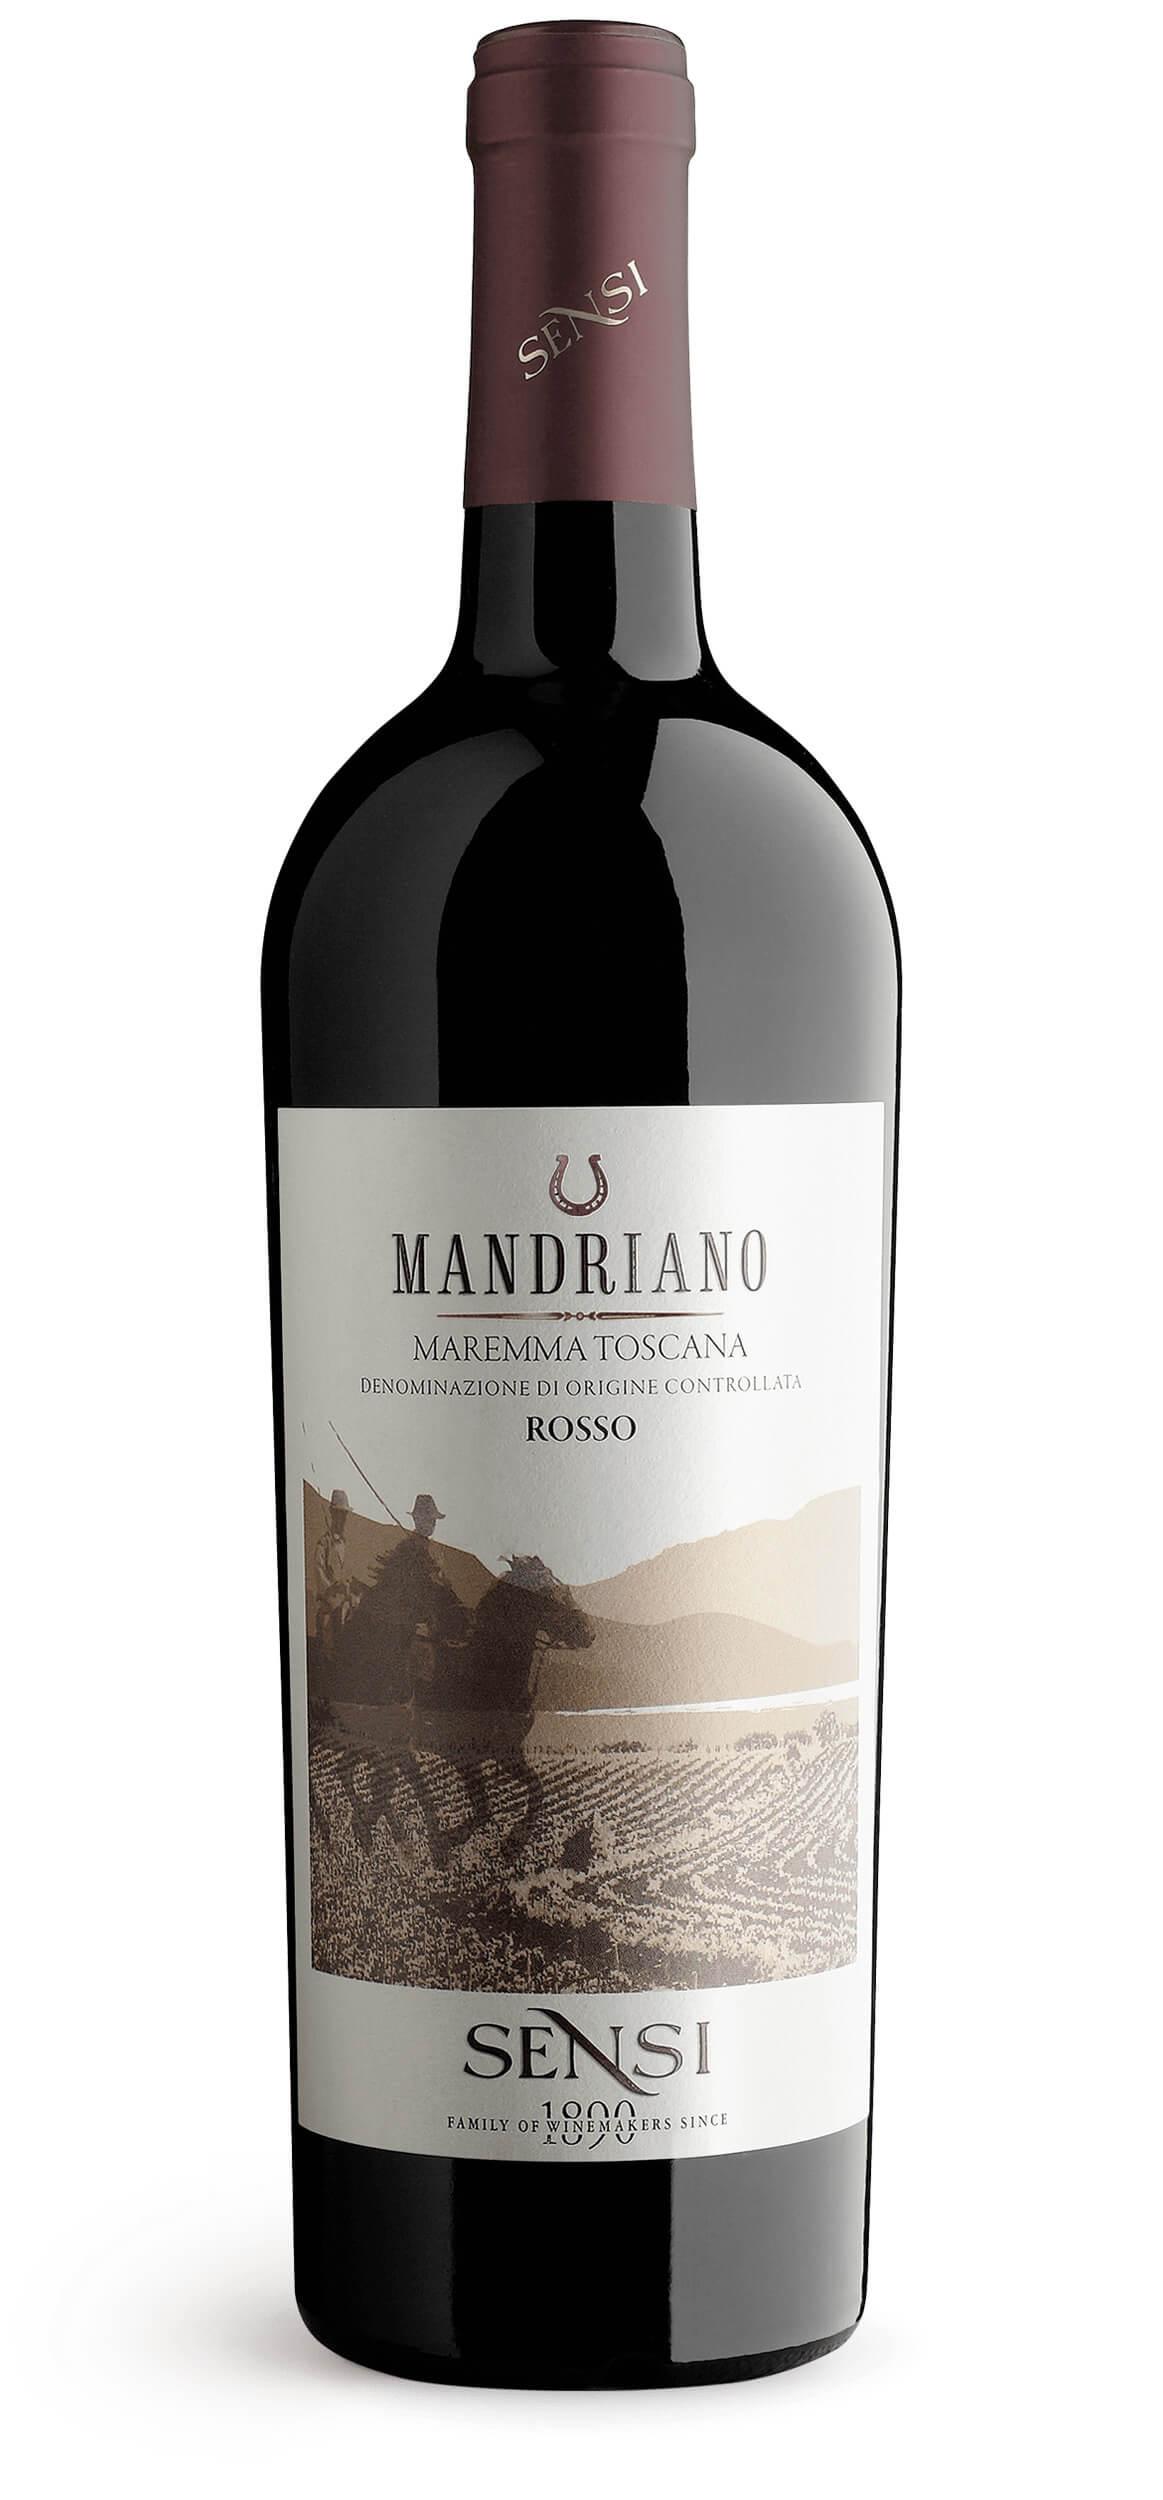 Sensi Classica Mandriano rosso